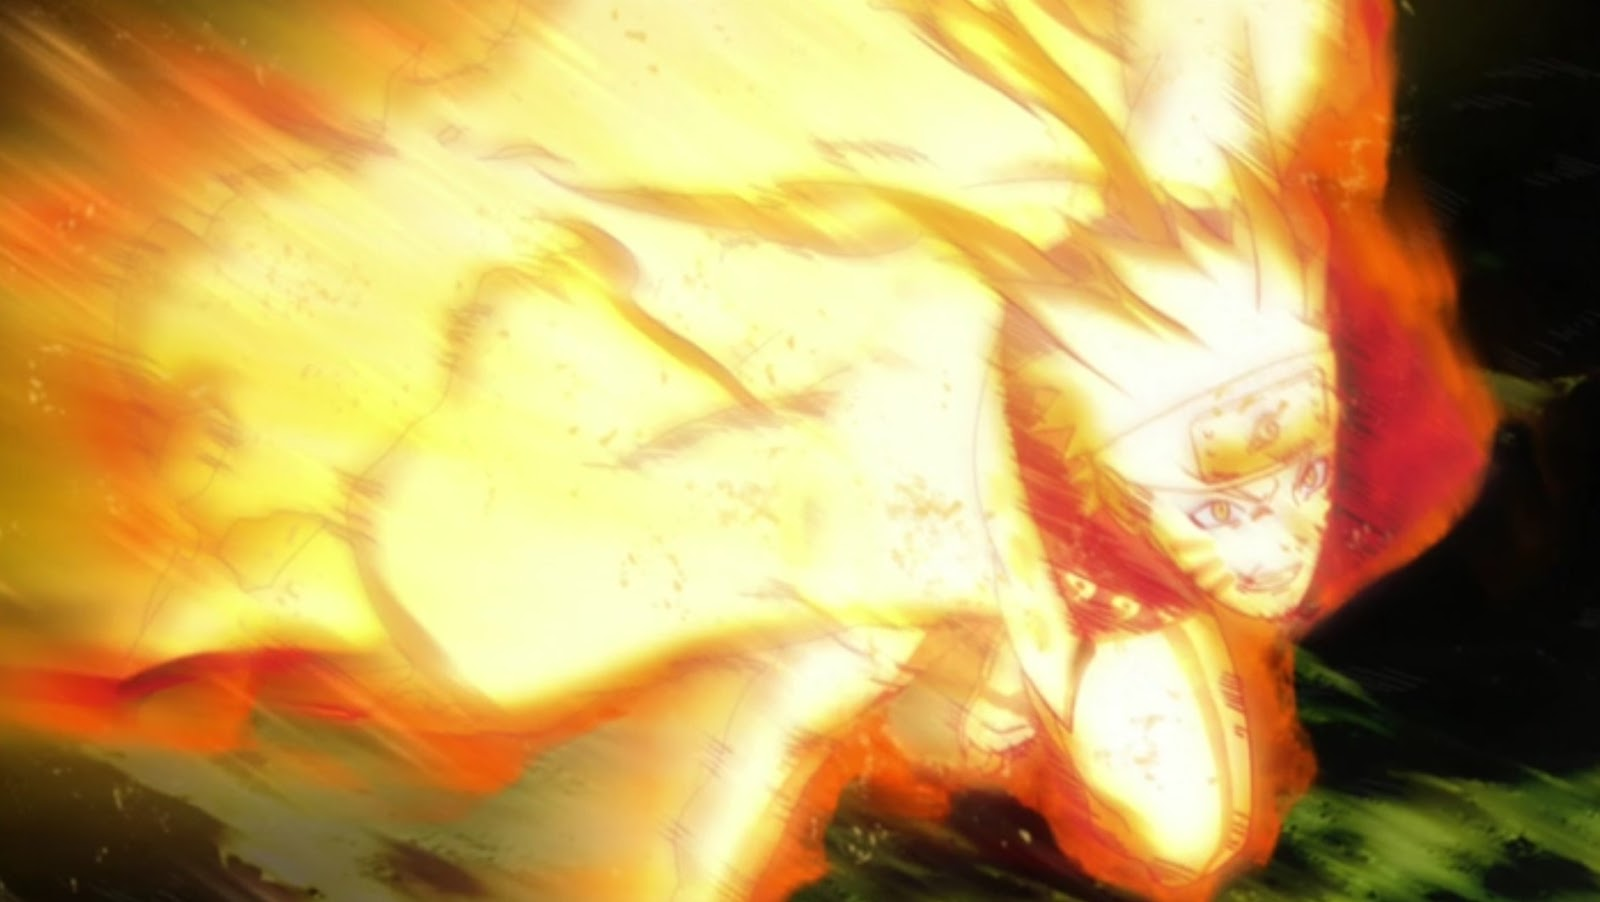 Naruto Shippuden: Episódio 342 – O Segredo do Ninjutsu Espaço-Tempo